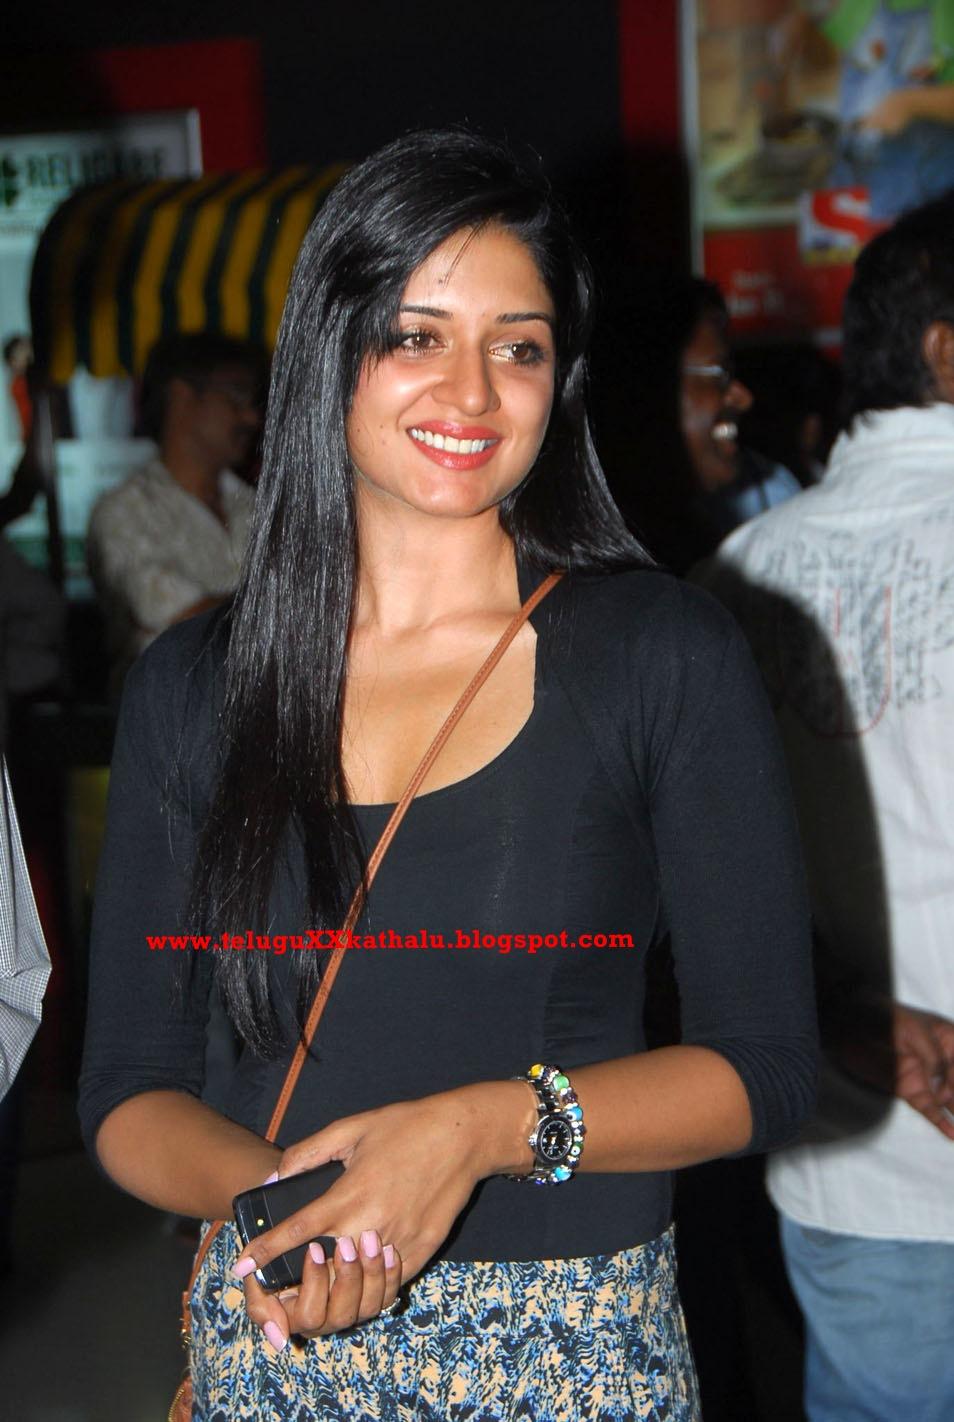 Multi Tallent 2012 Vimala Raman Lanja Hot Pics